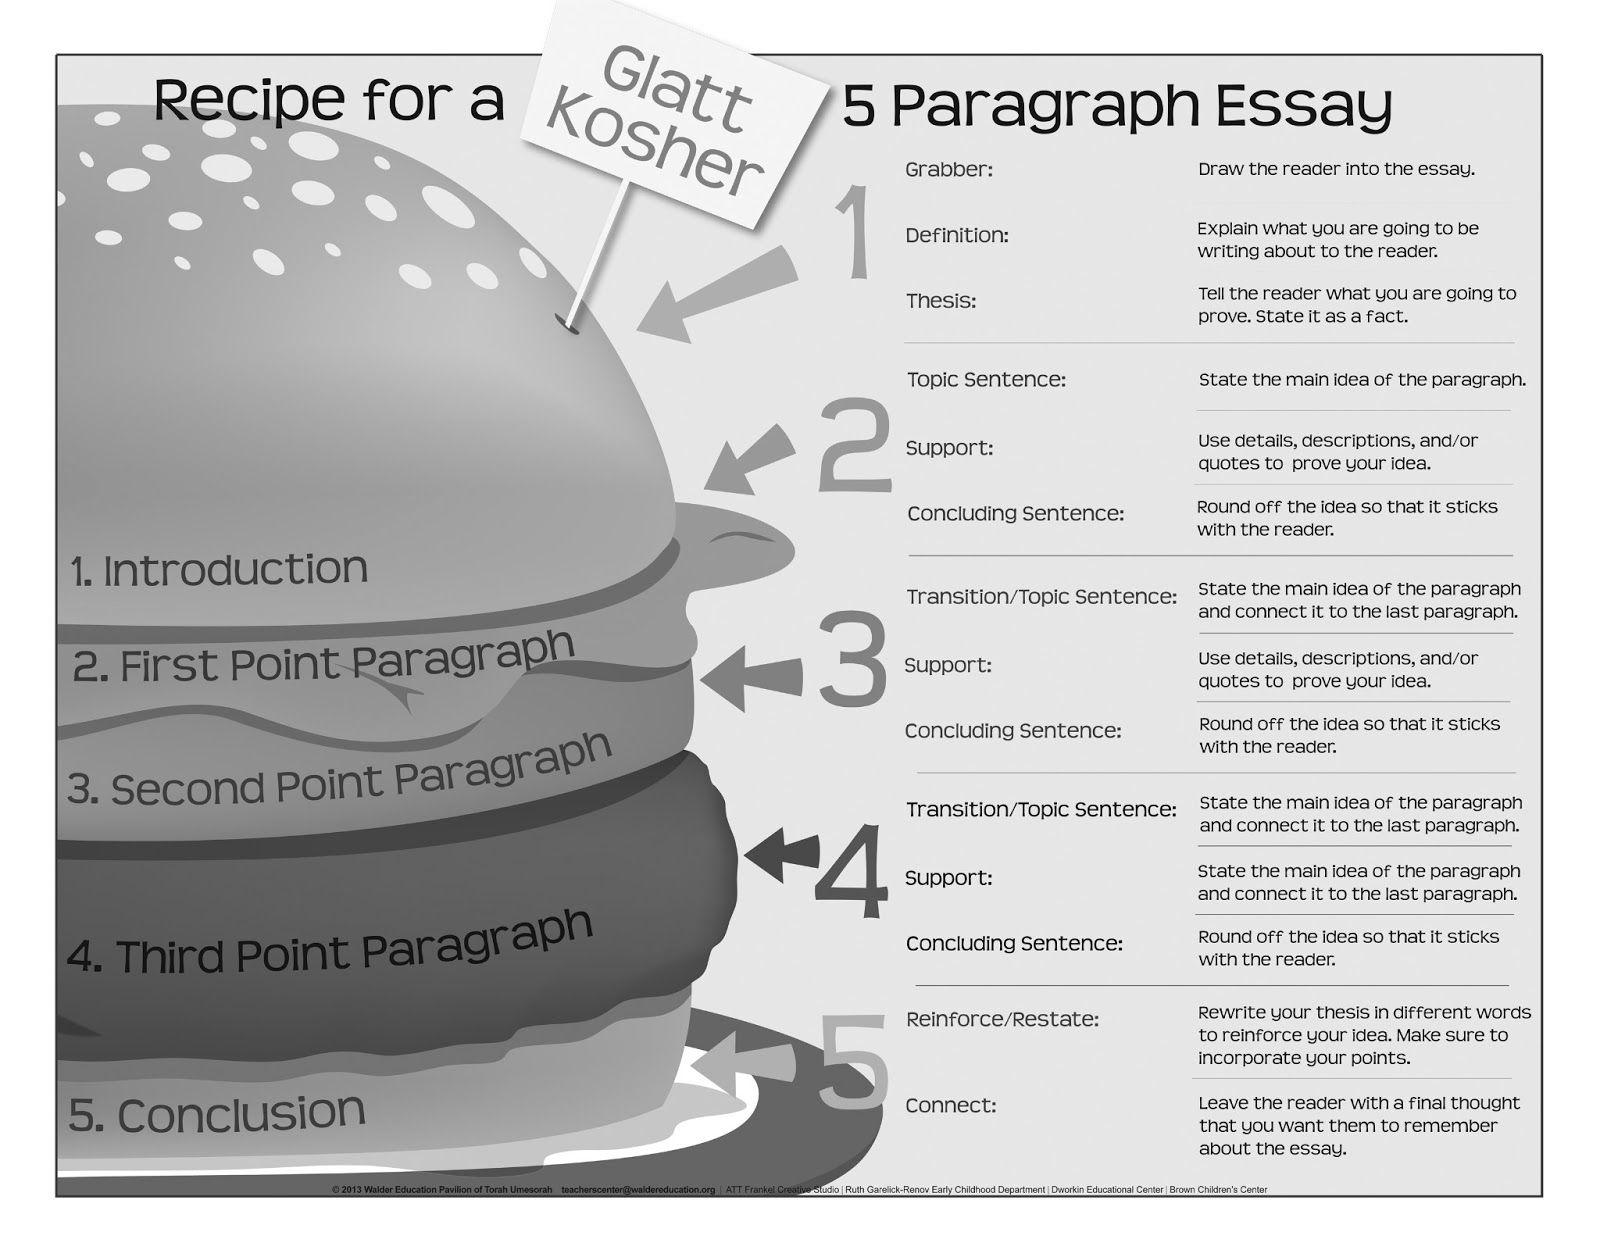 5 Paragraph Essay Structure Poster